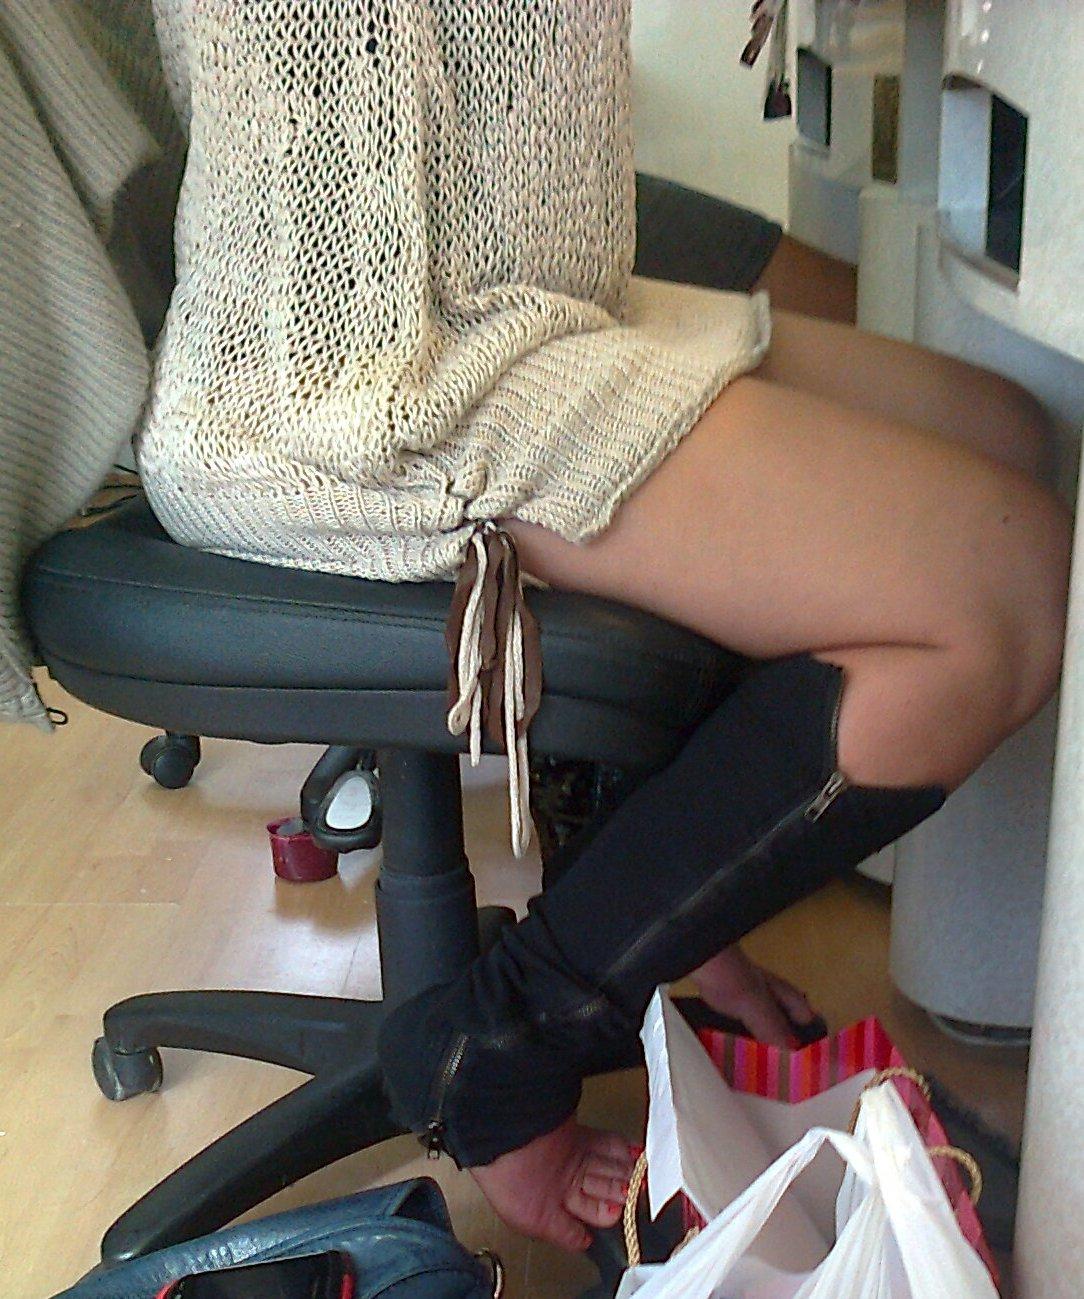 School Shoes Trample Slave